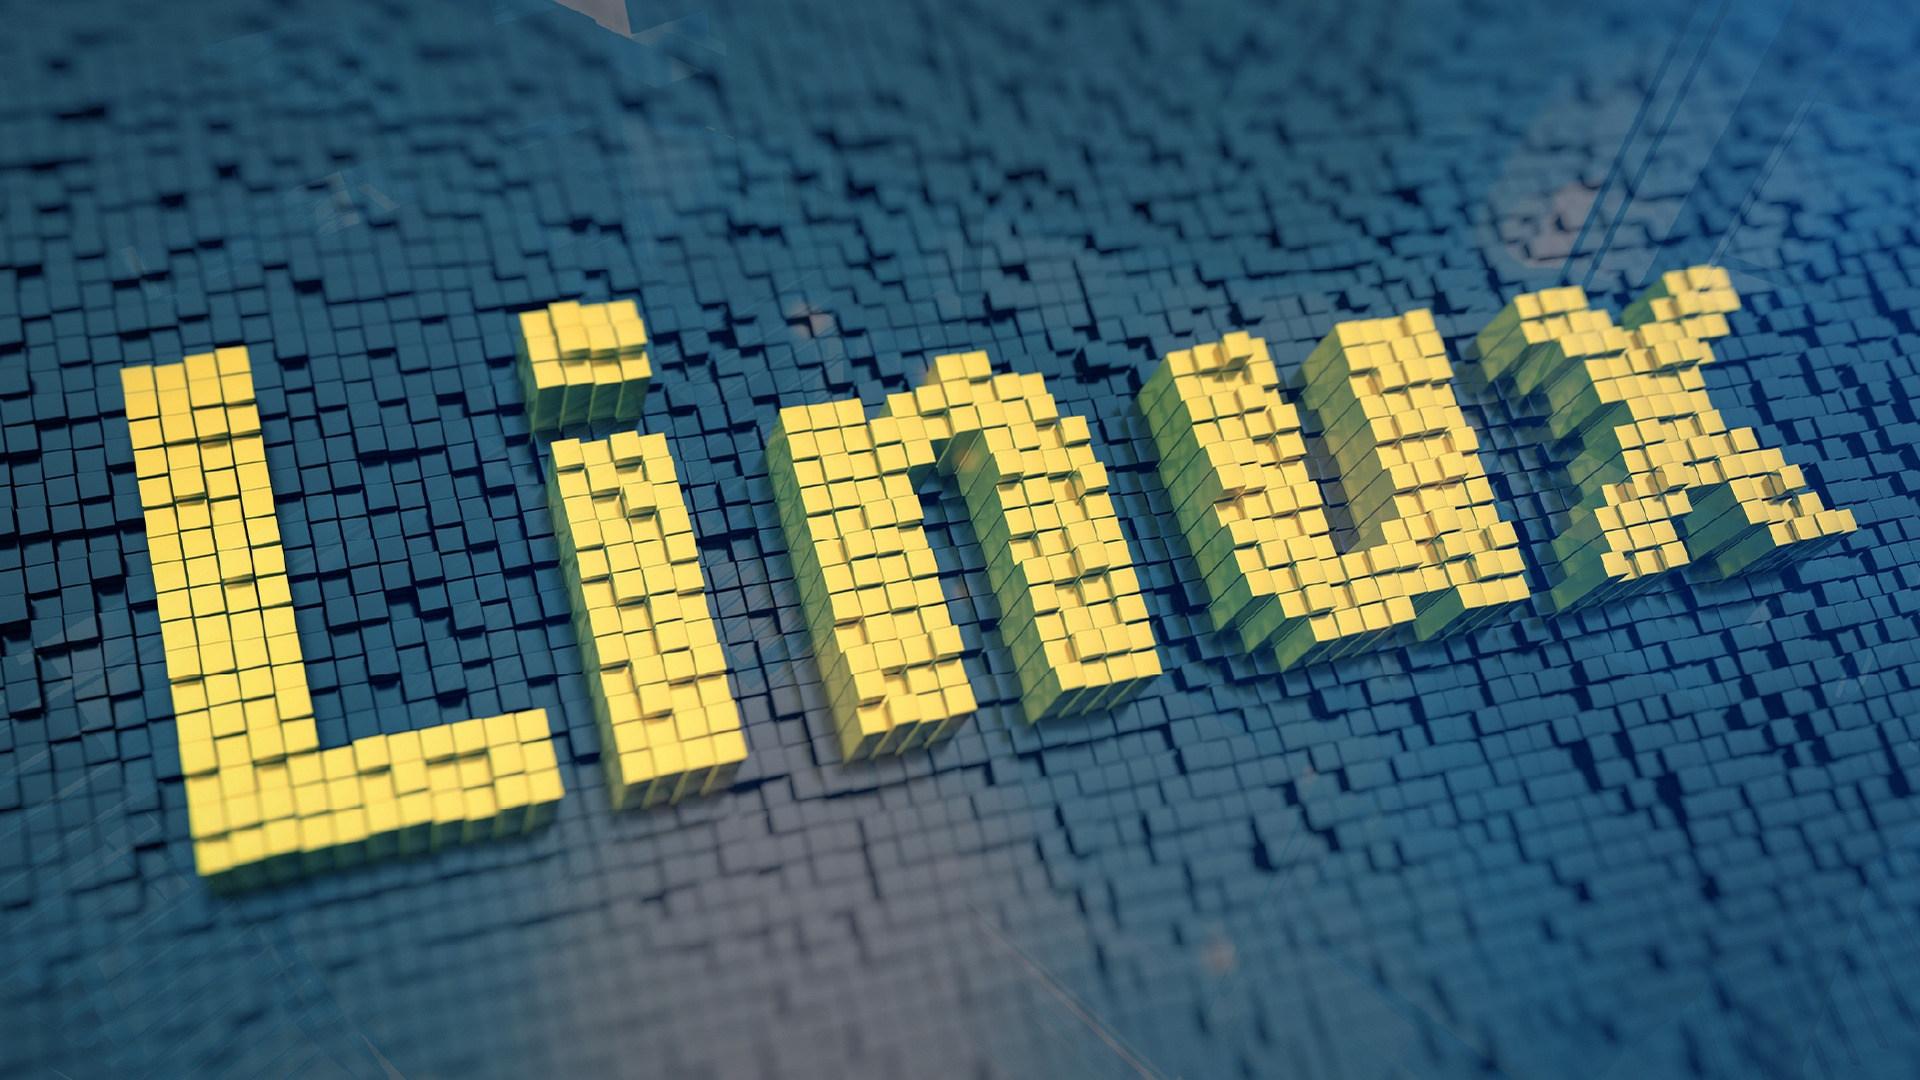 Betriebssystem, Sicherheit, Sicherheitslücke, Hacker, Security, Linux, Hacking, Cybersecurity, Hacken, Hacks, Unix, Basis